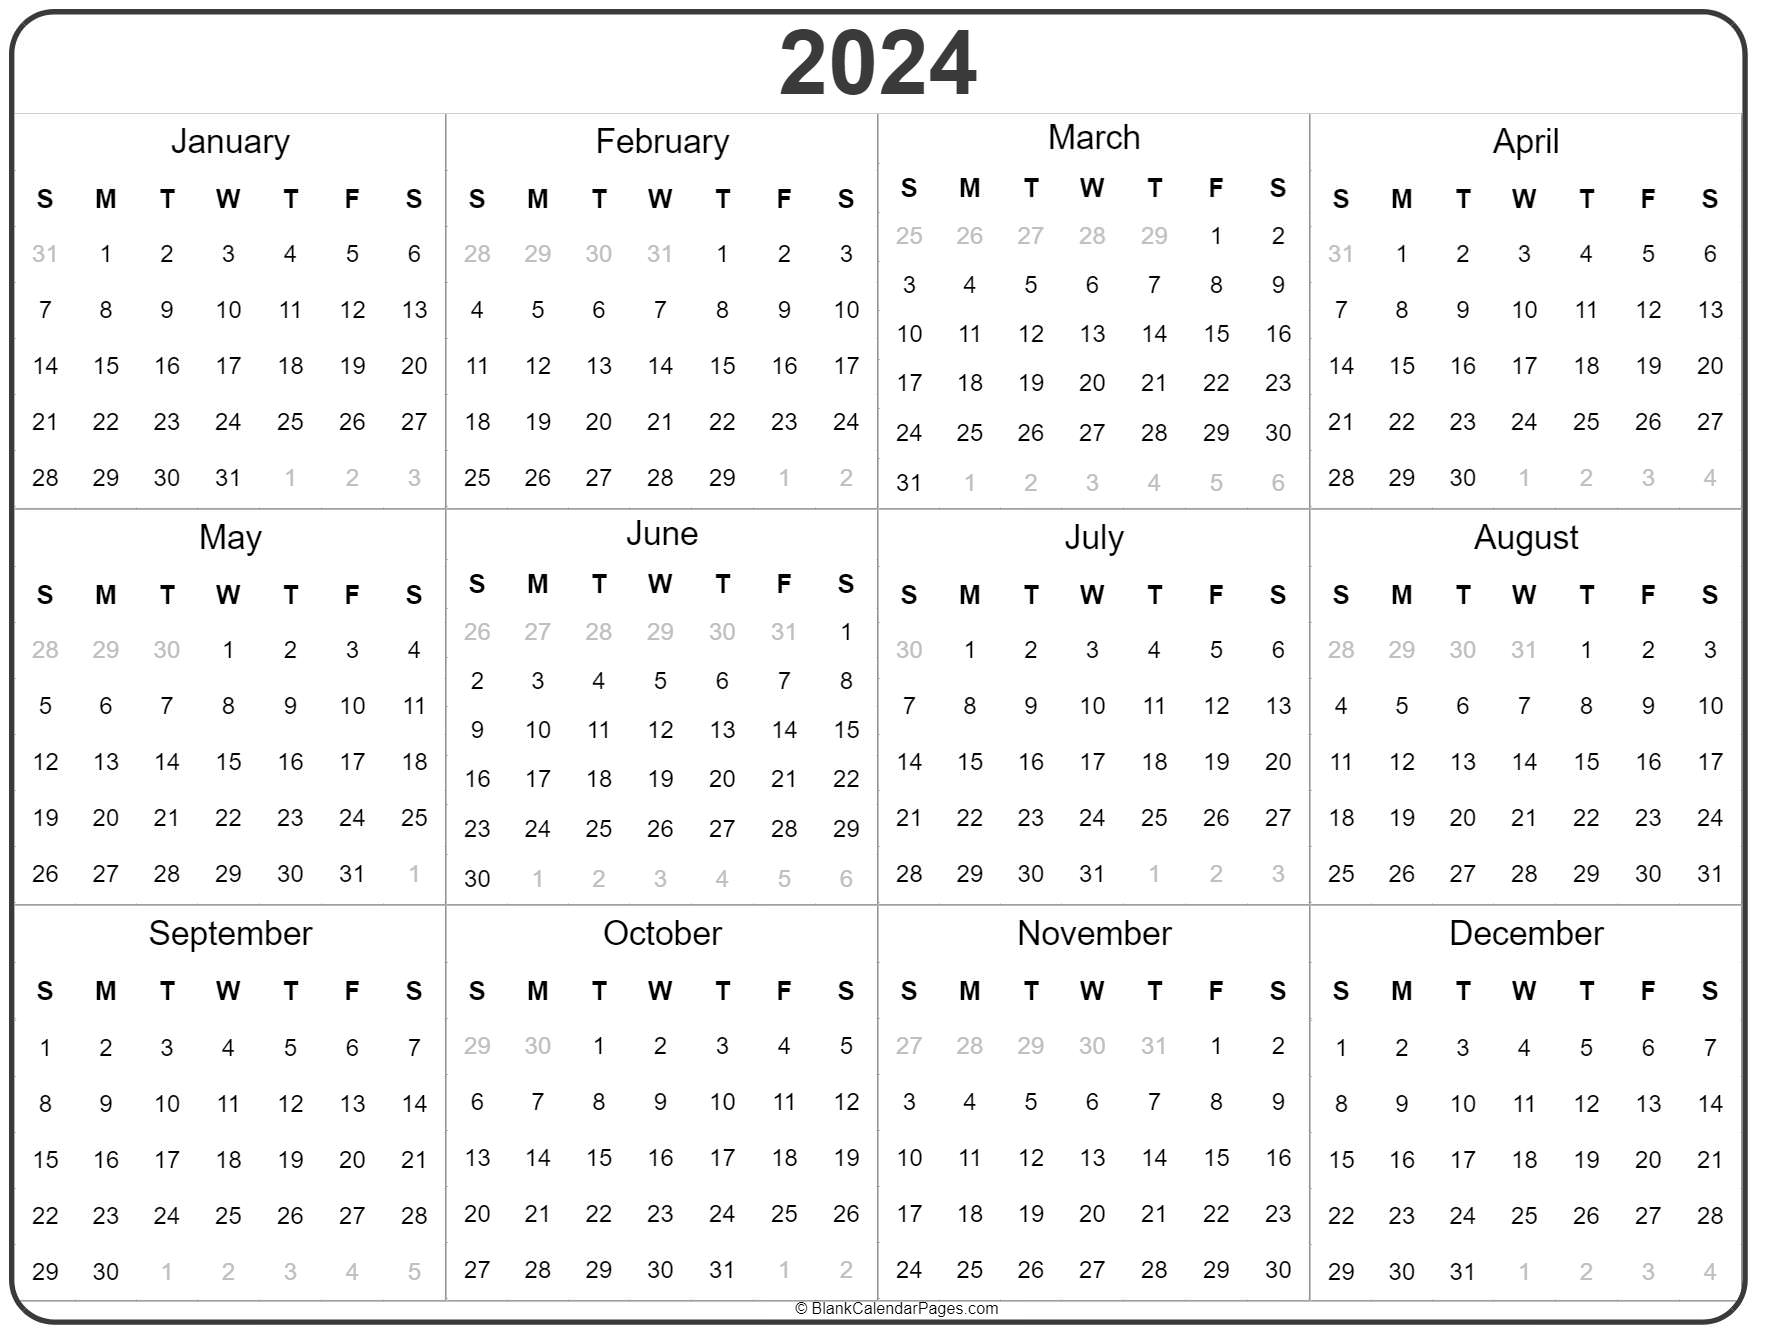 2024 year calendar template